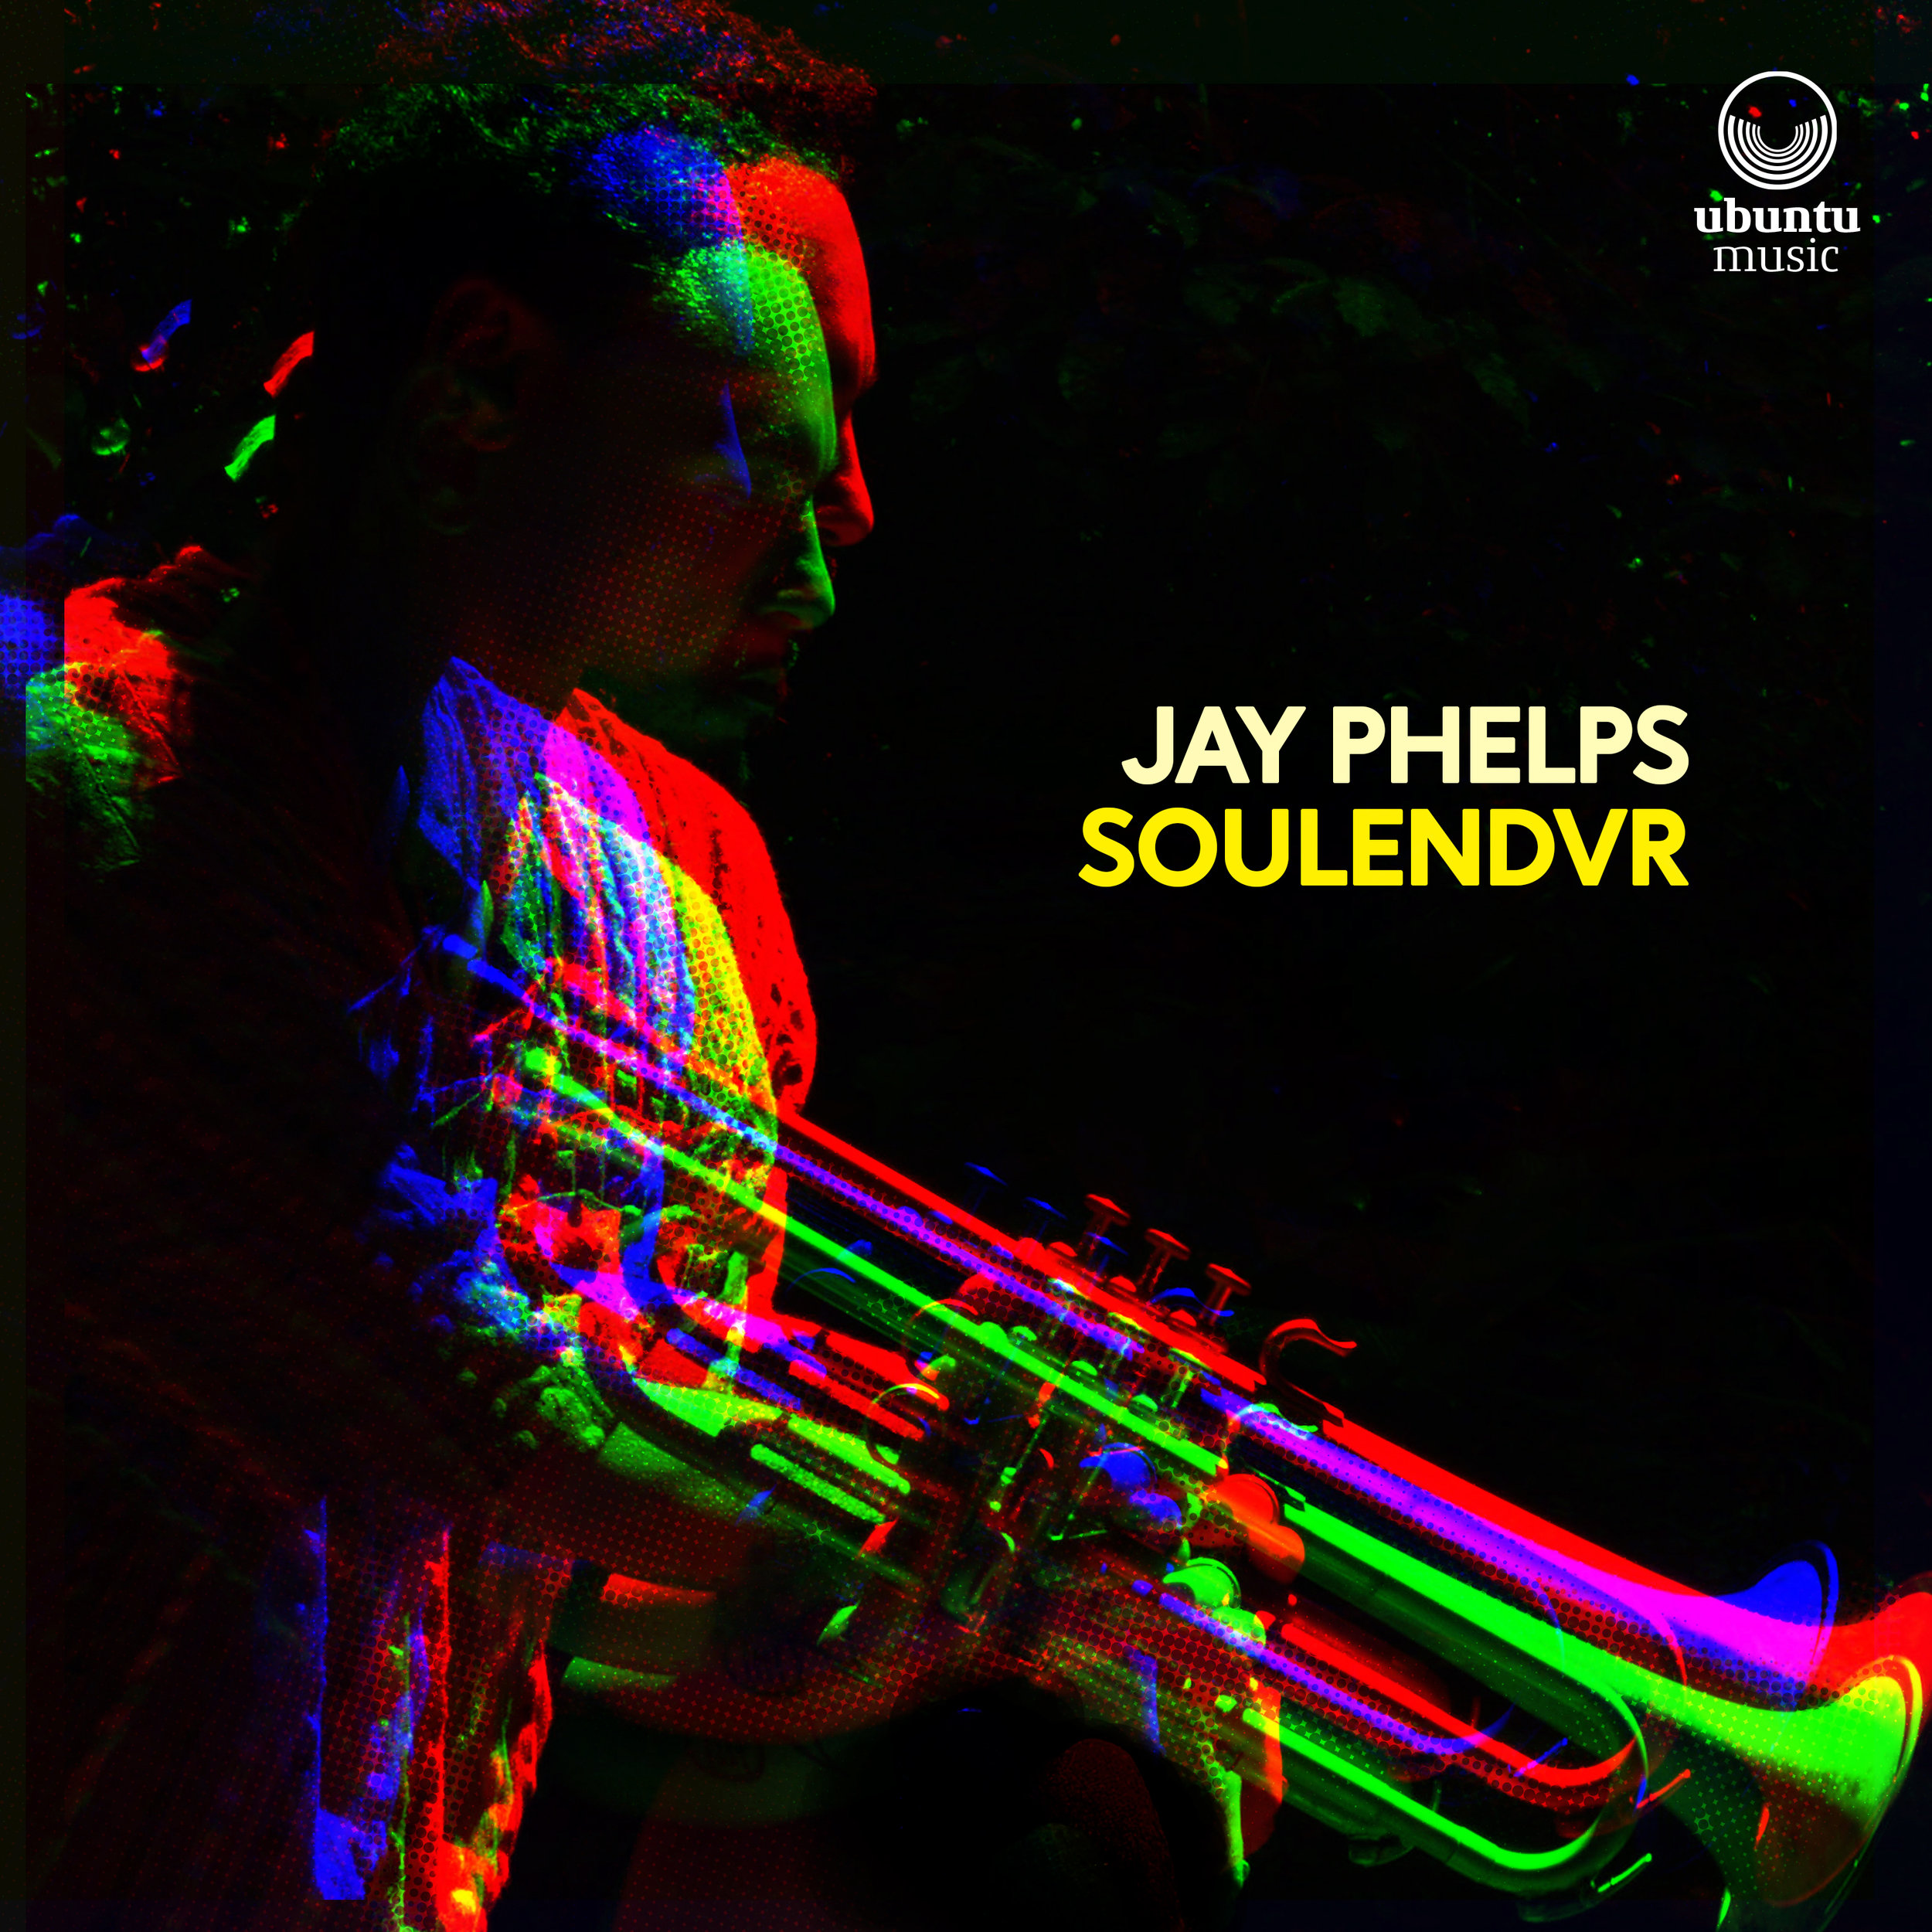 Jay Phelps